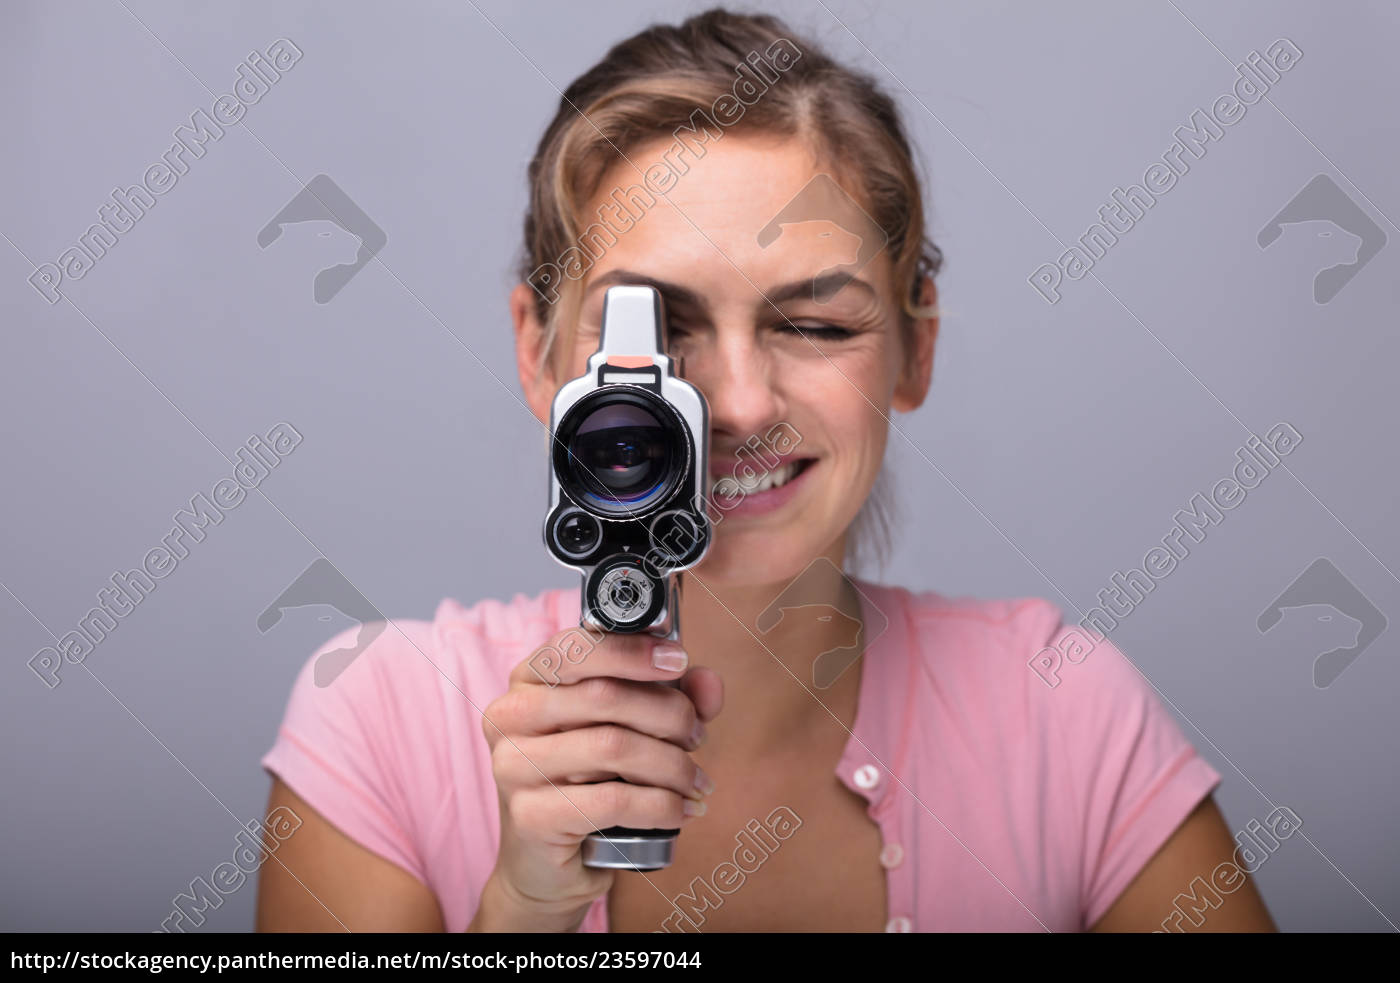 woman, looking, through, lens, of, retro - 23597044